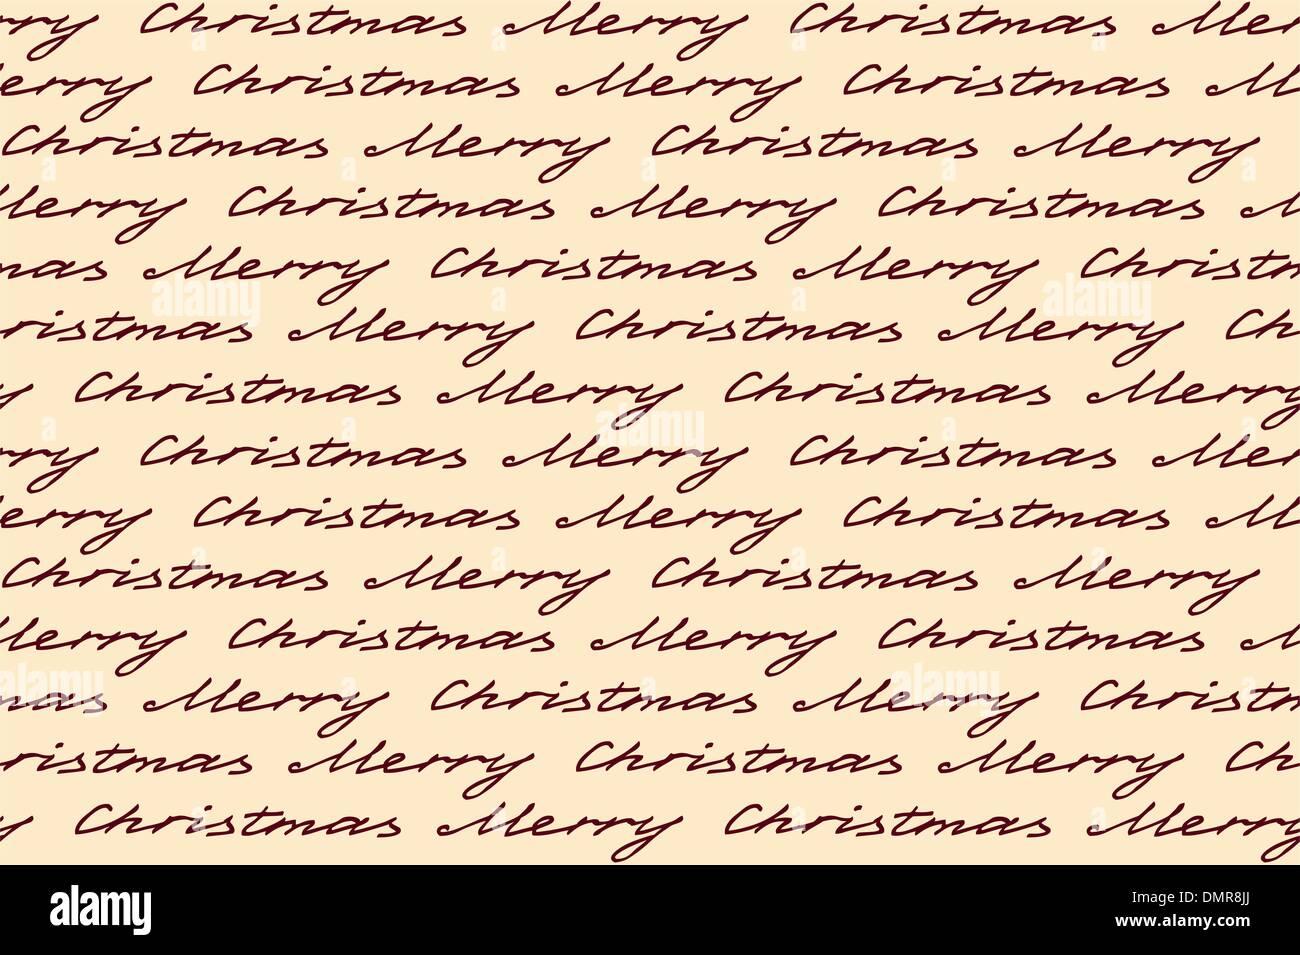 merry christmas words stock image